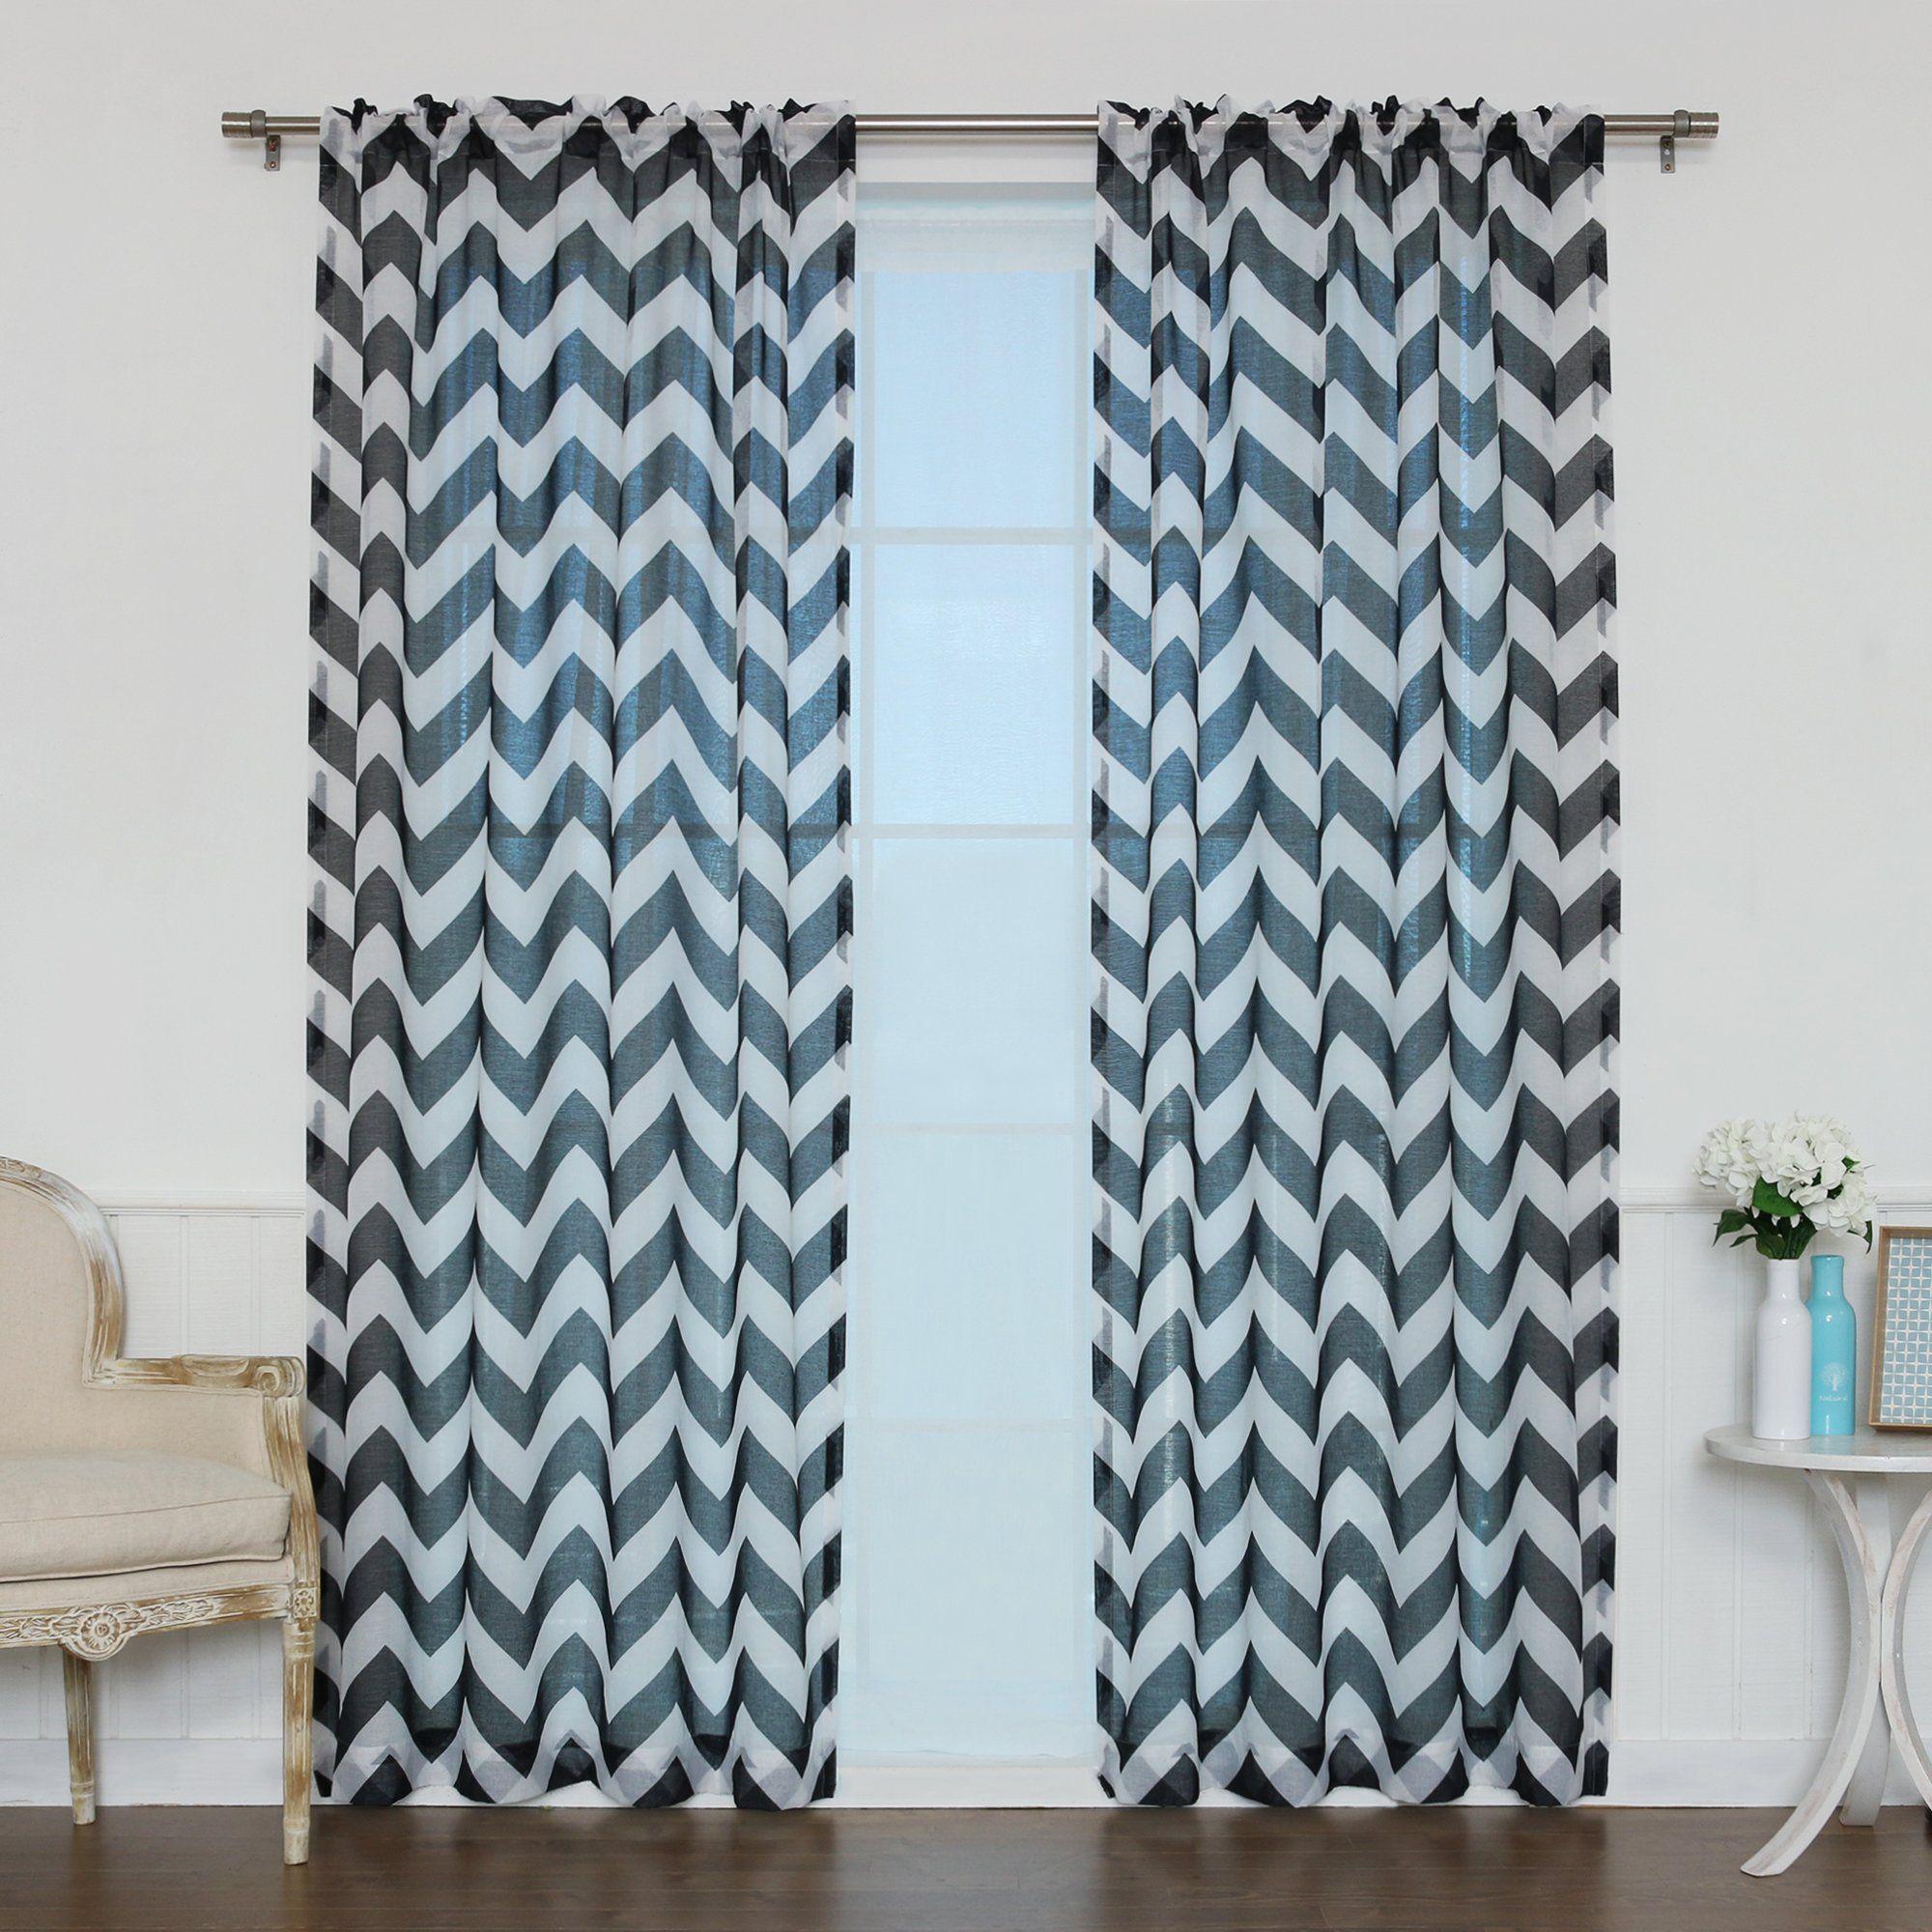 Amazon.com - Best Home Fashion Faux Sheer Gauzy Linen Chevron Print ...